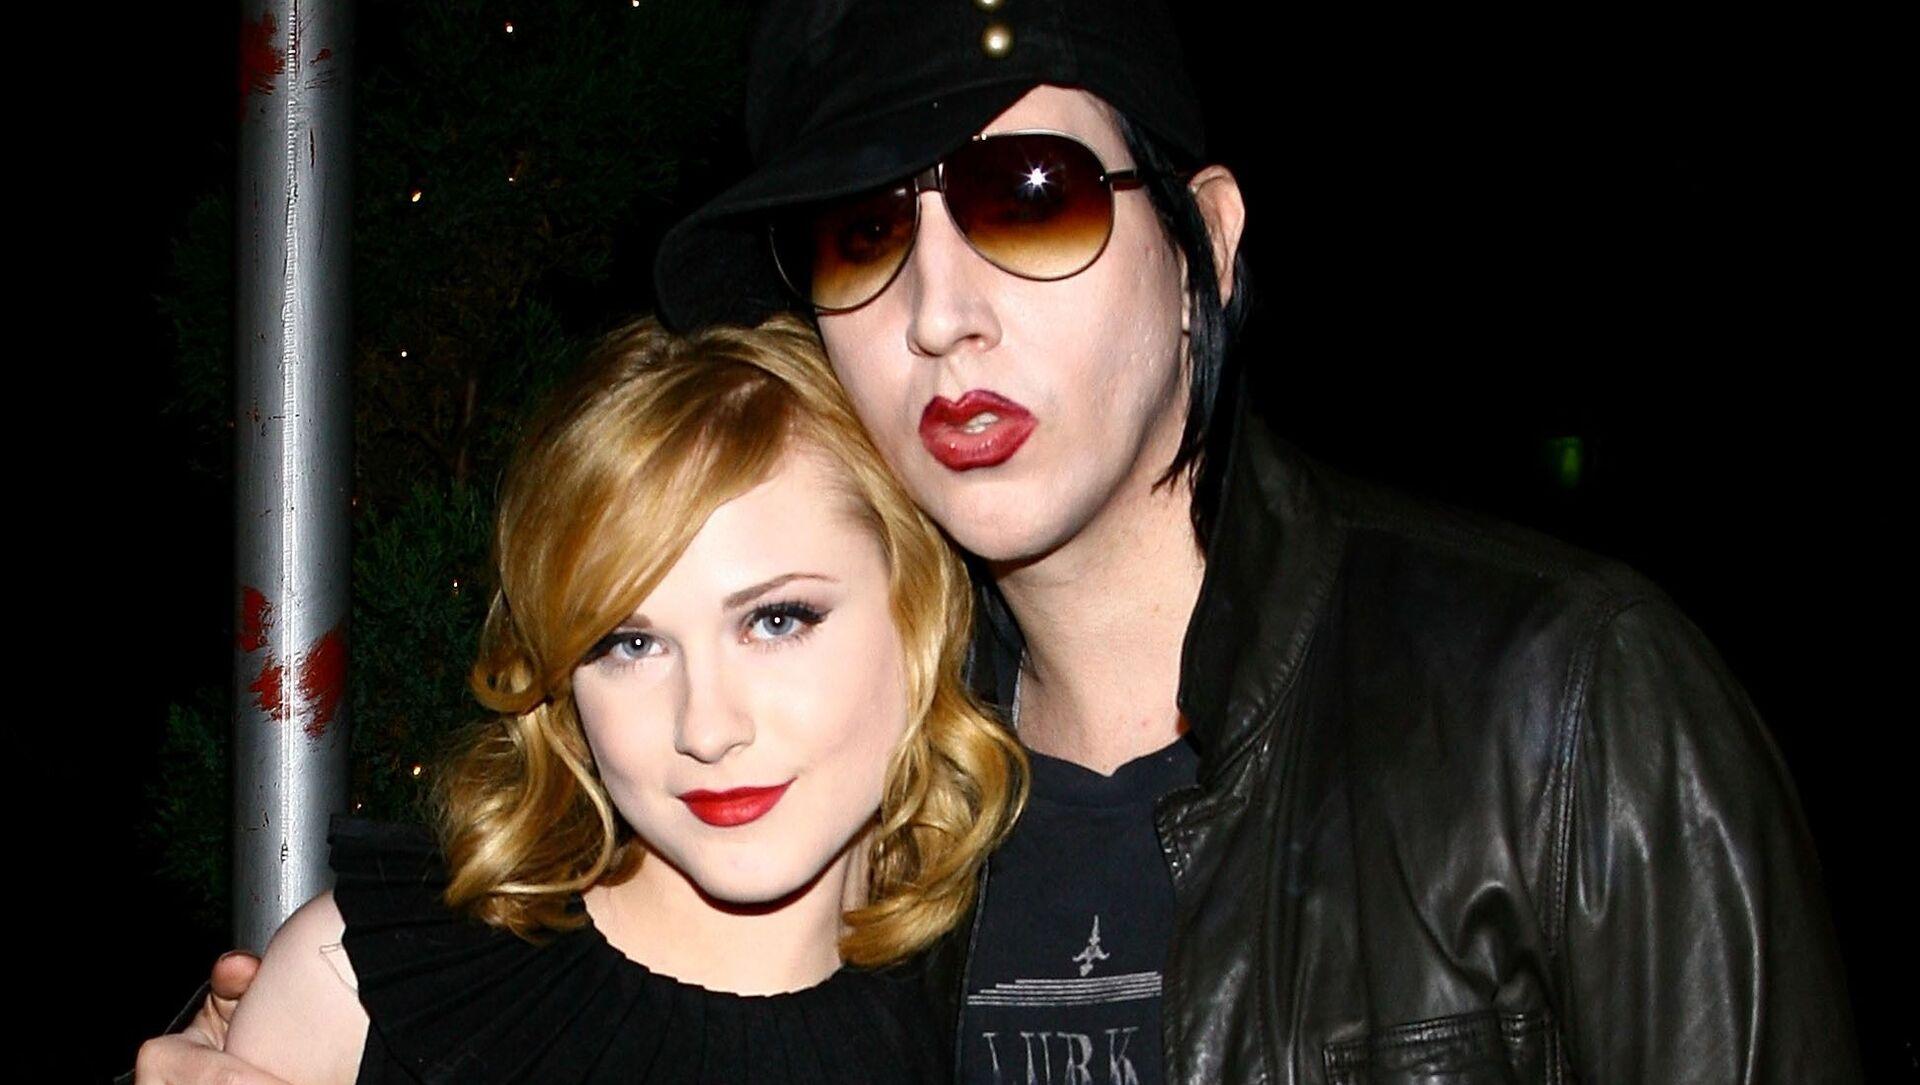 La actriz Evan Rachel Wood junto a Marilyn Manson en 2007 - Sputnik Mundo, 1920, 01.02.2021